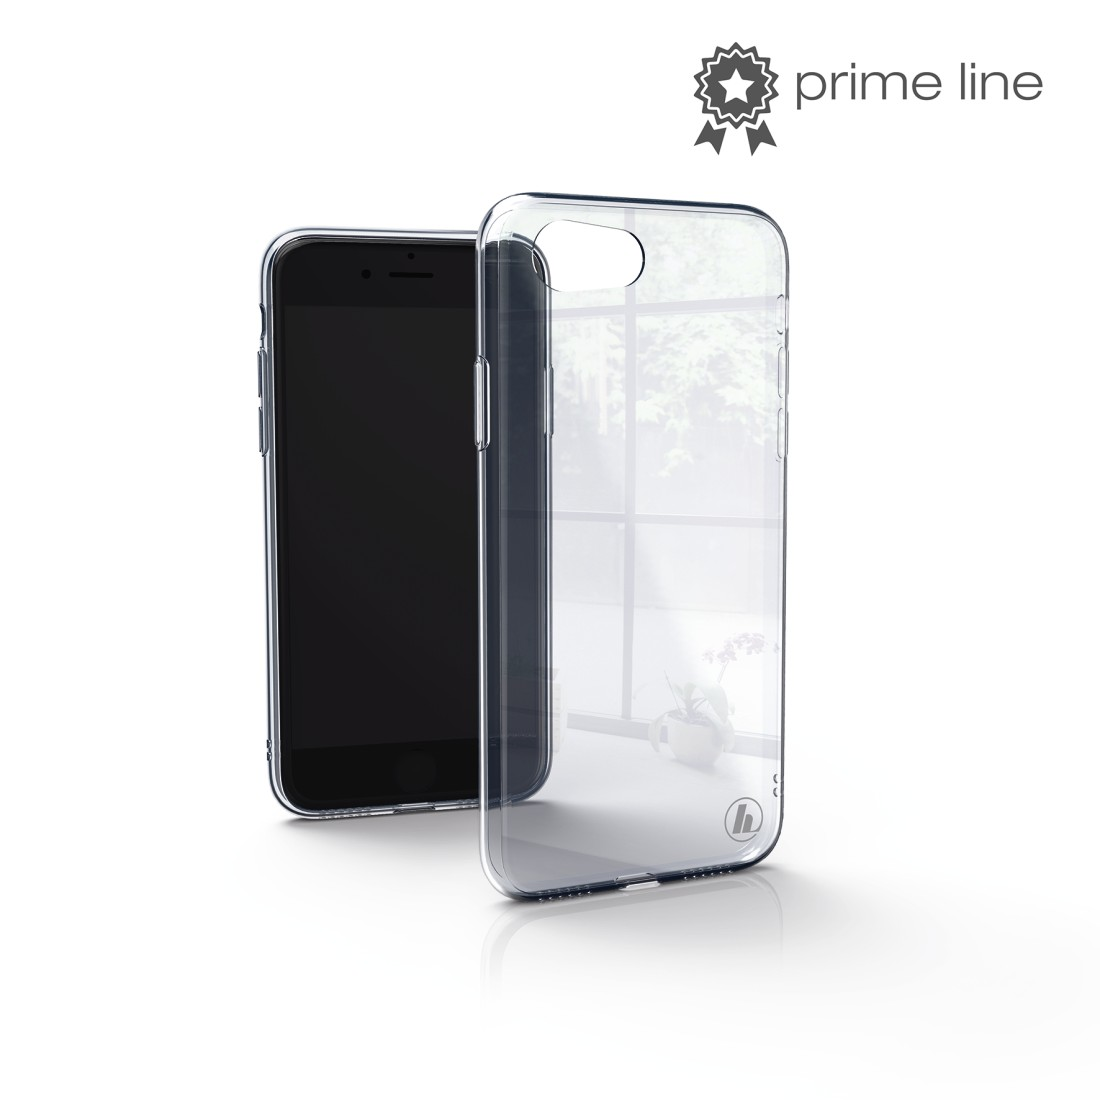 Spate Glass iPh7/8,transp